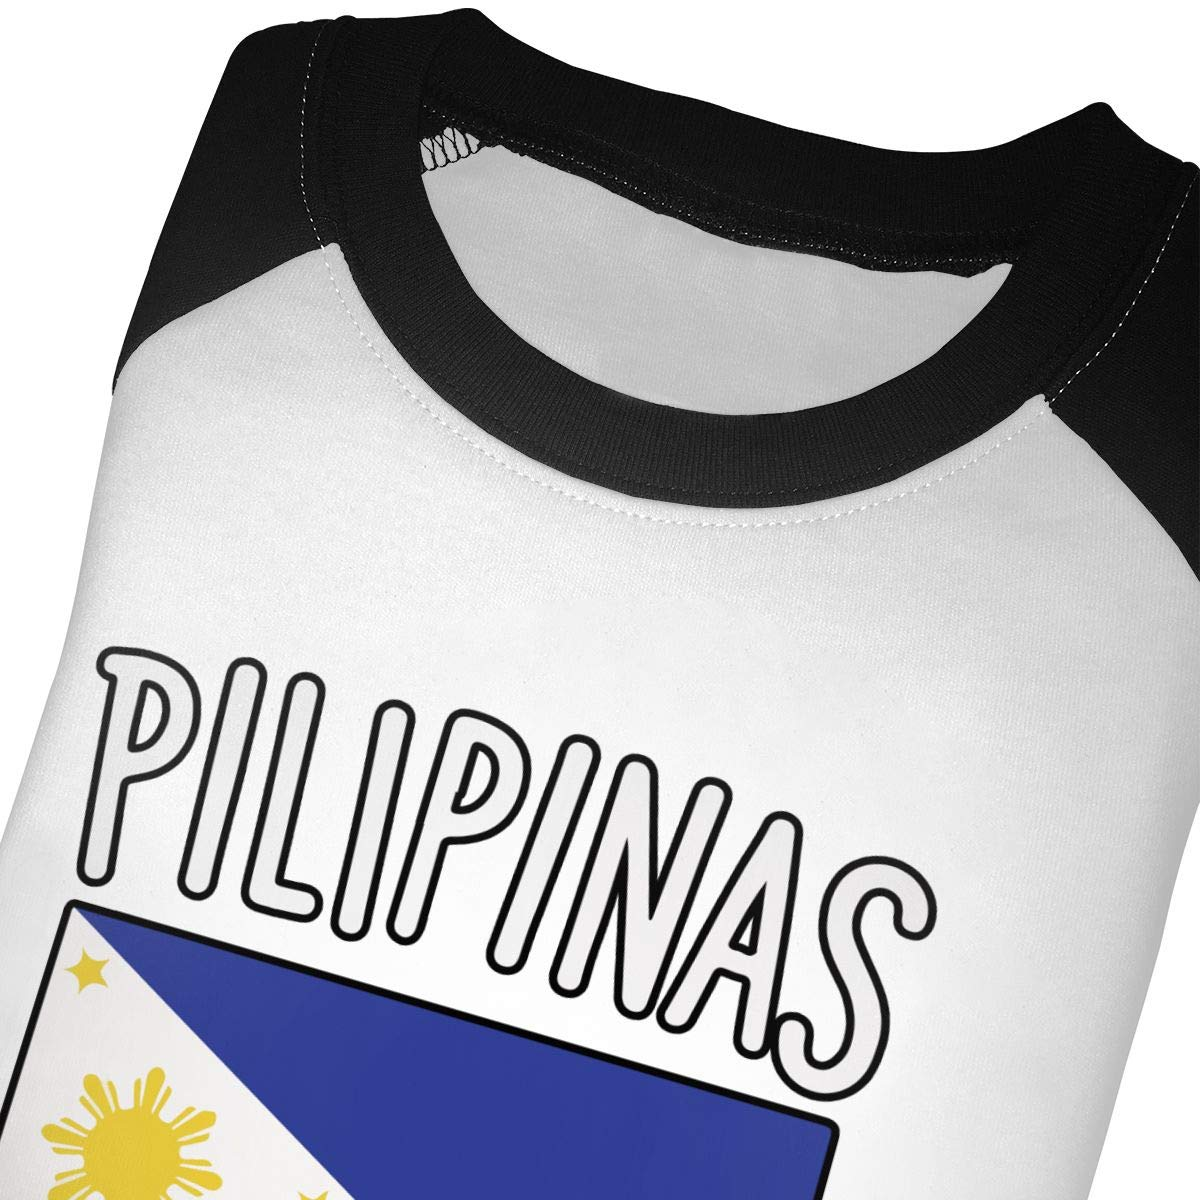 QPKMRTZTX0 Boys Girls Kids /& Toddler Philippines Flag1-1 Long Sleeve Tees 100/% Cotton